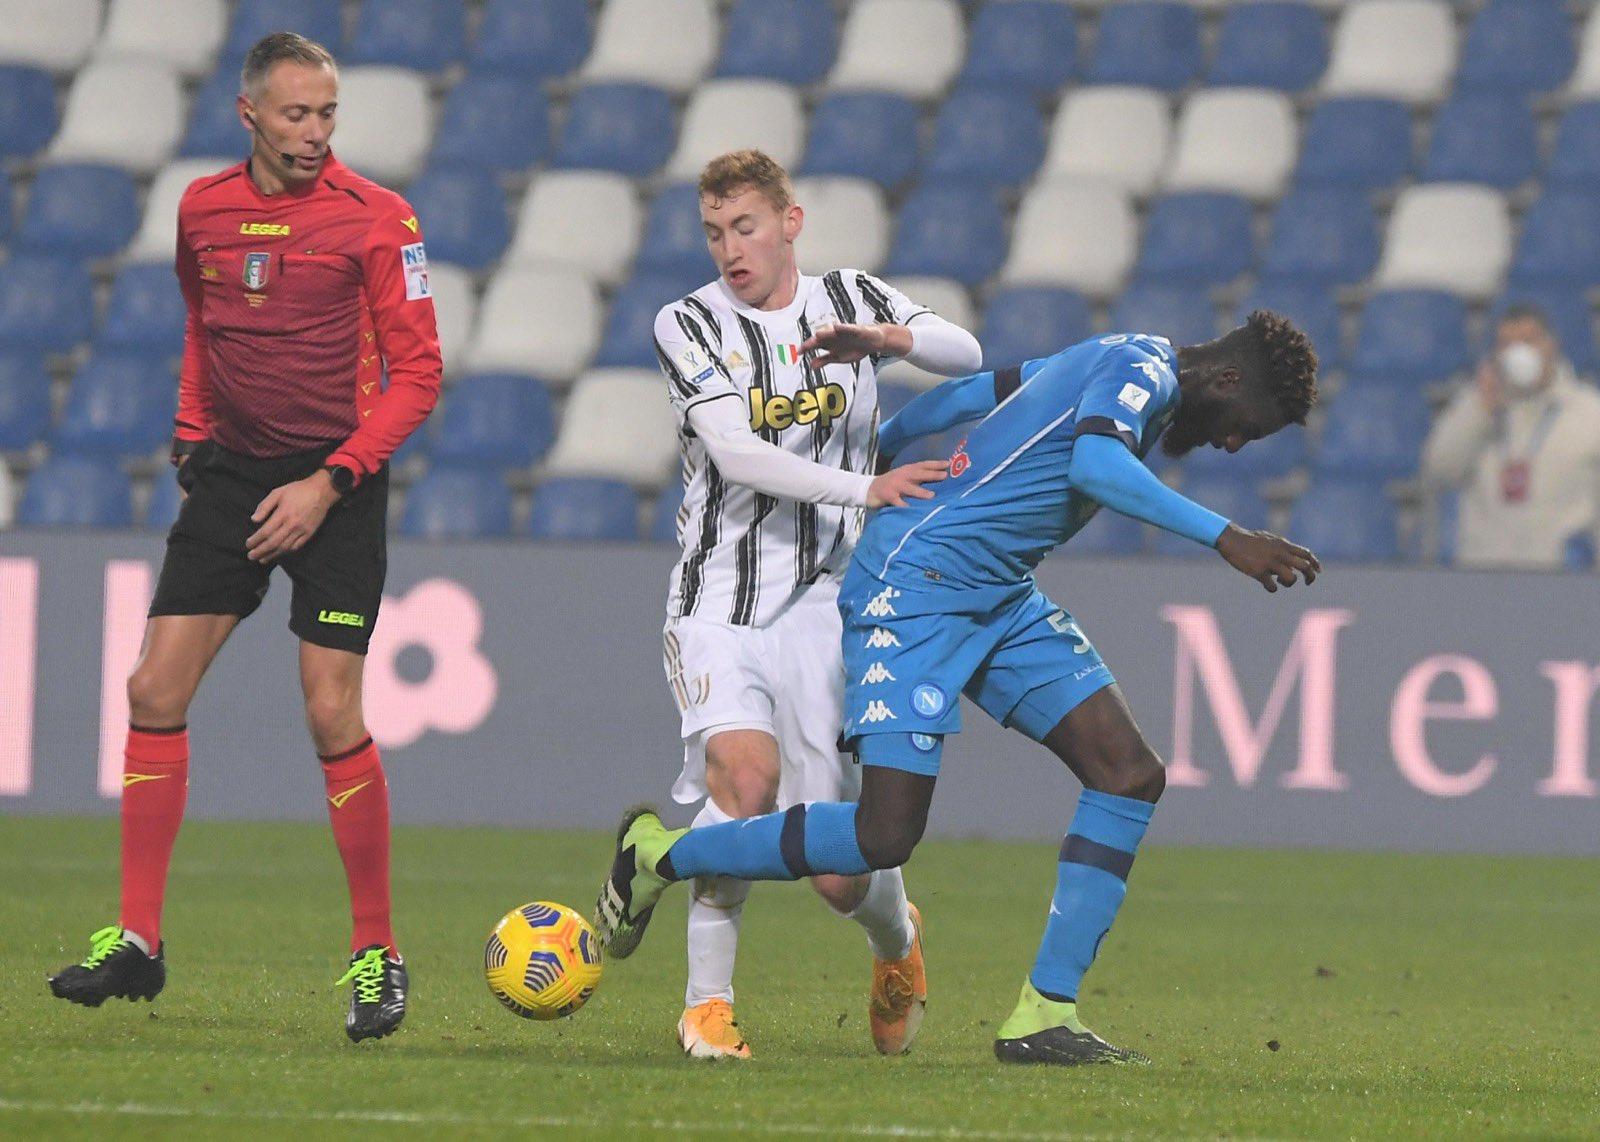 Sampdoria-Napoli sarà diretta dall'arbitro Valeri